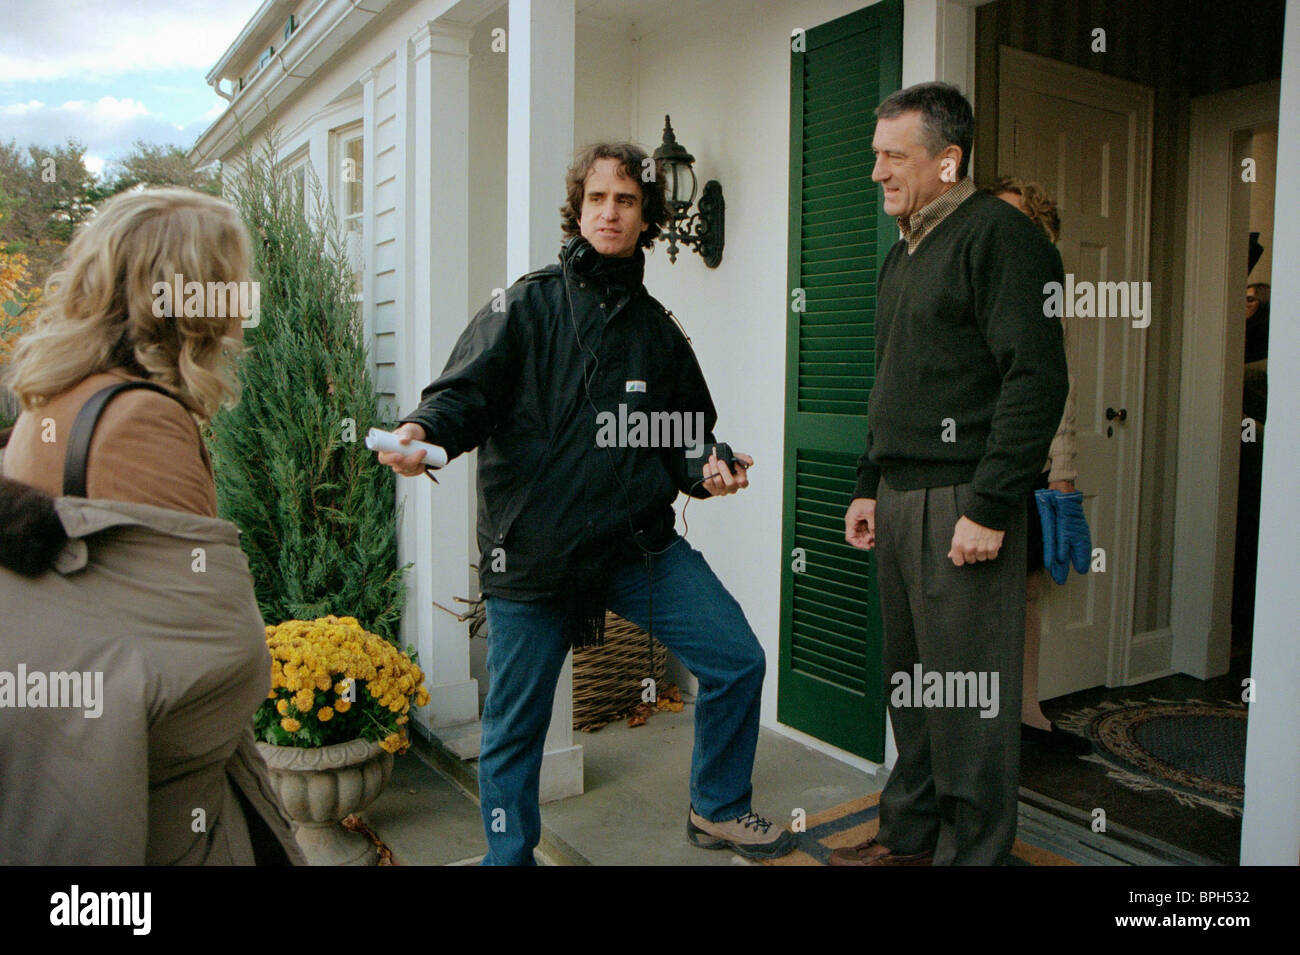 JAY ROACH & ROBERT DE NIRO MEET THE PARENTS (2000) - Stock Image